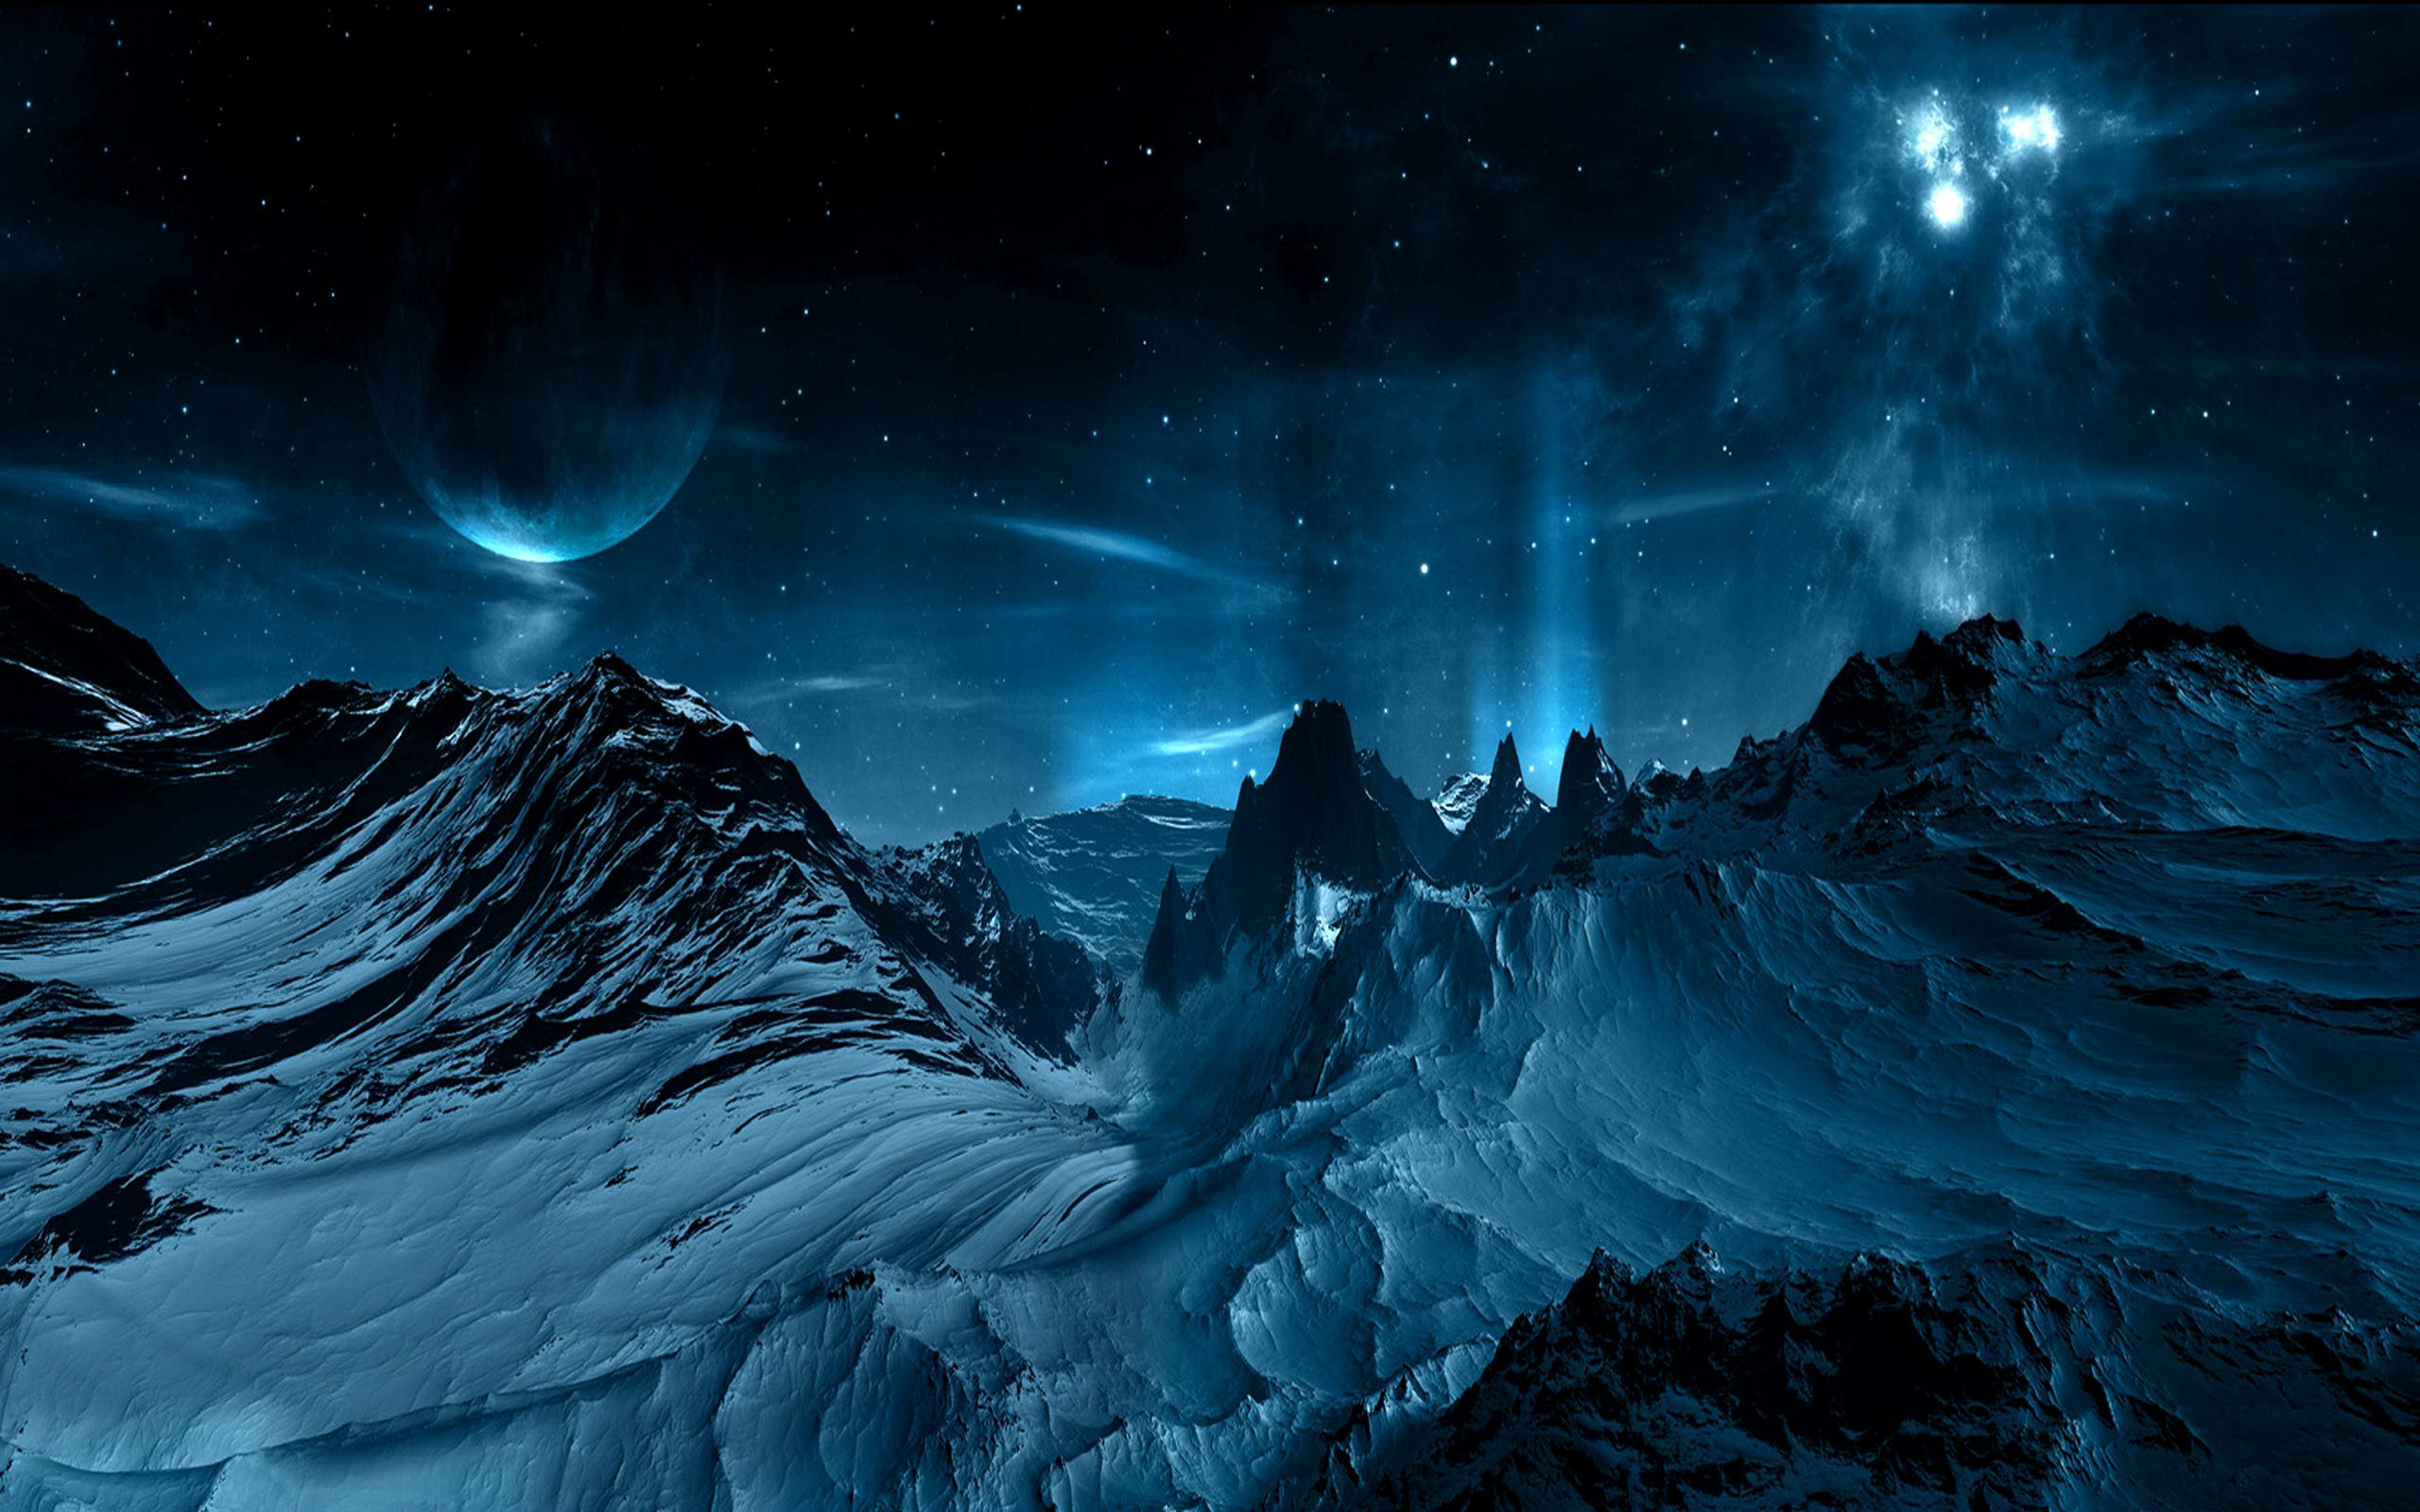 Visions Computer Wallpapers Desktop Backgrounds 2560x1600 Id Sci Fi Wallpaper Night Sky Wallpaper Landscape Wallpaper